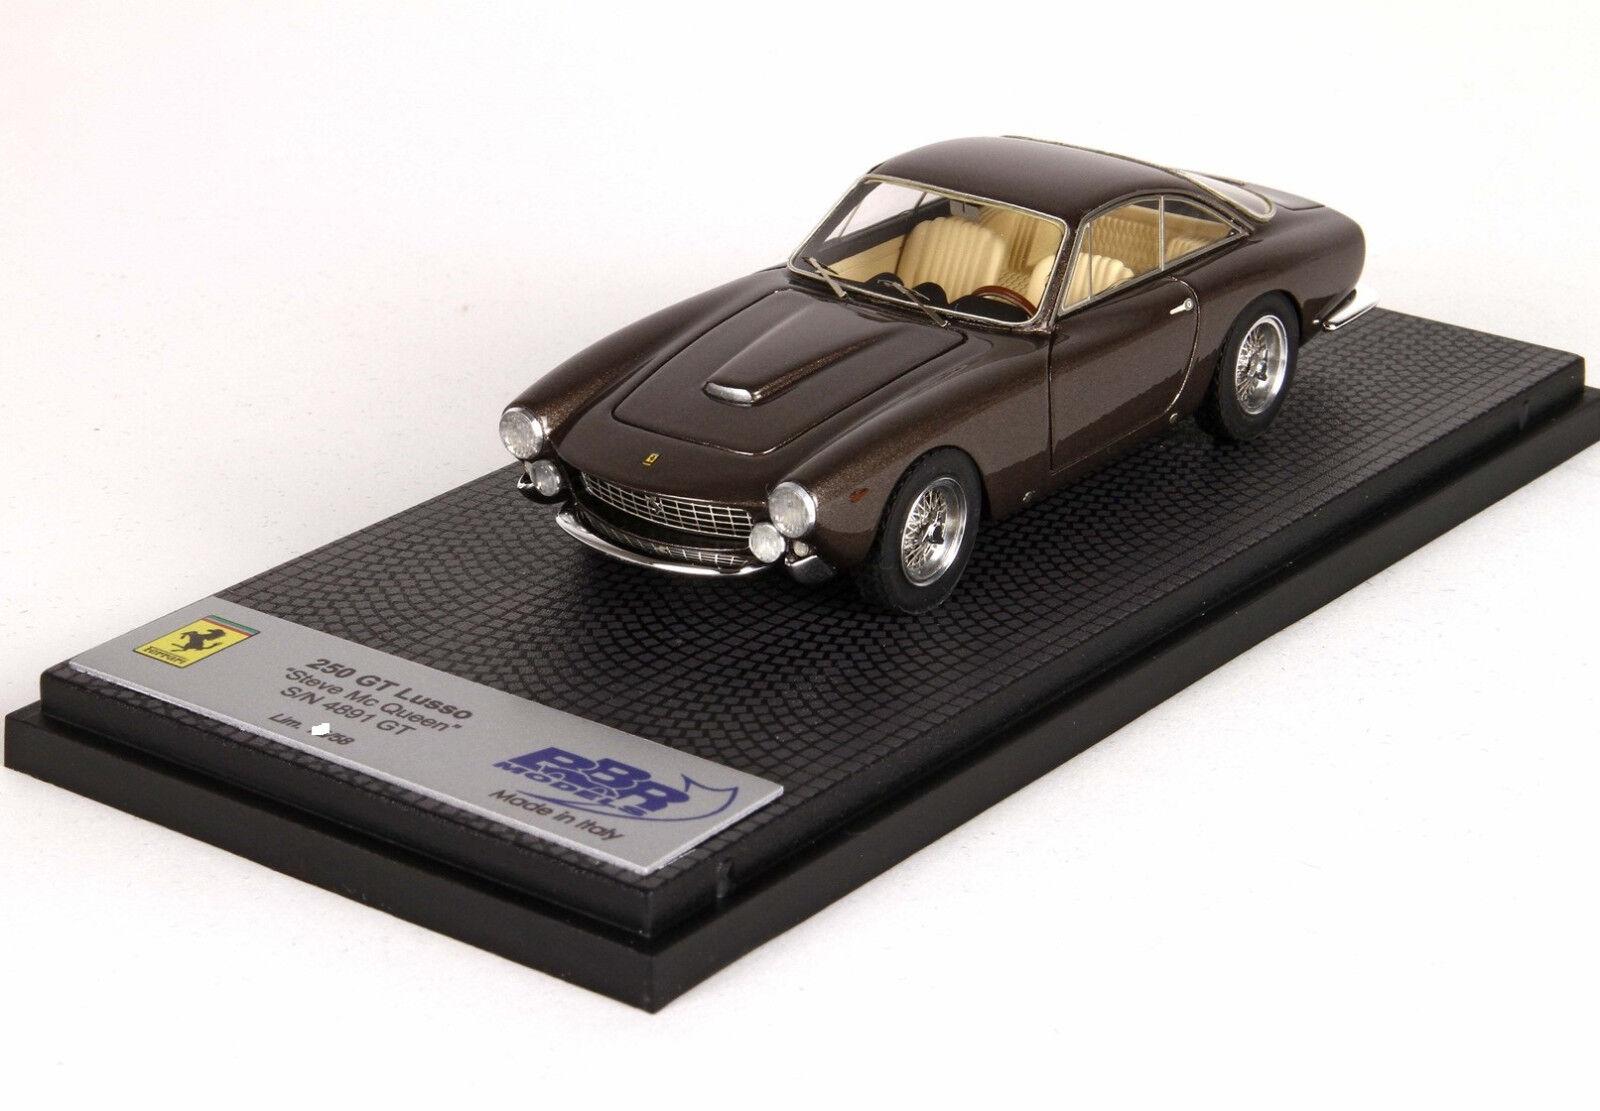 Ferrari 250 GT Lusso S N 4891 STEVE MC QUEEN 1 43 lim.ed. 58 pcs CAR05 BBR